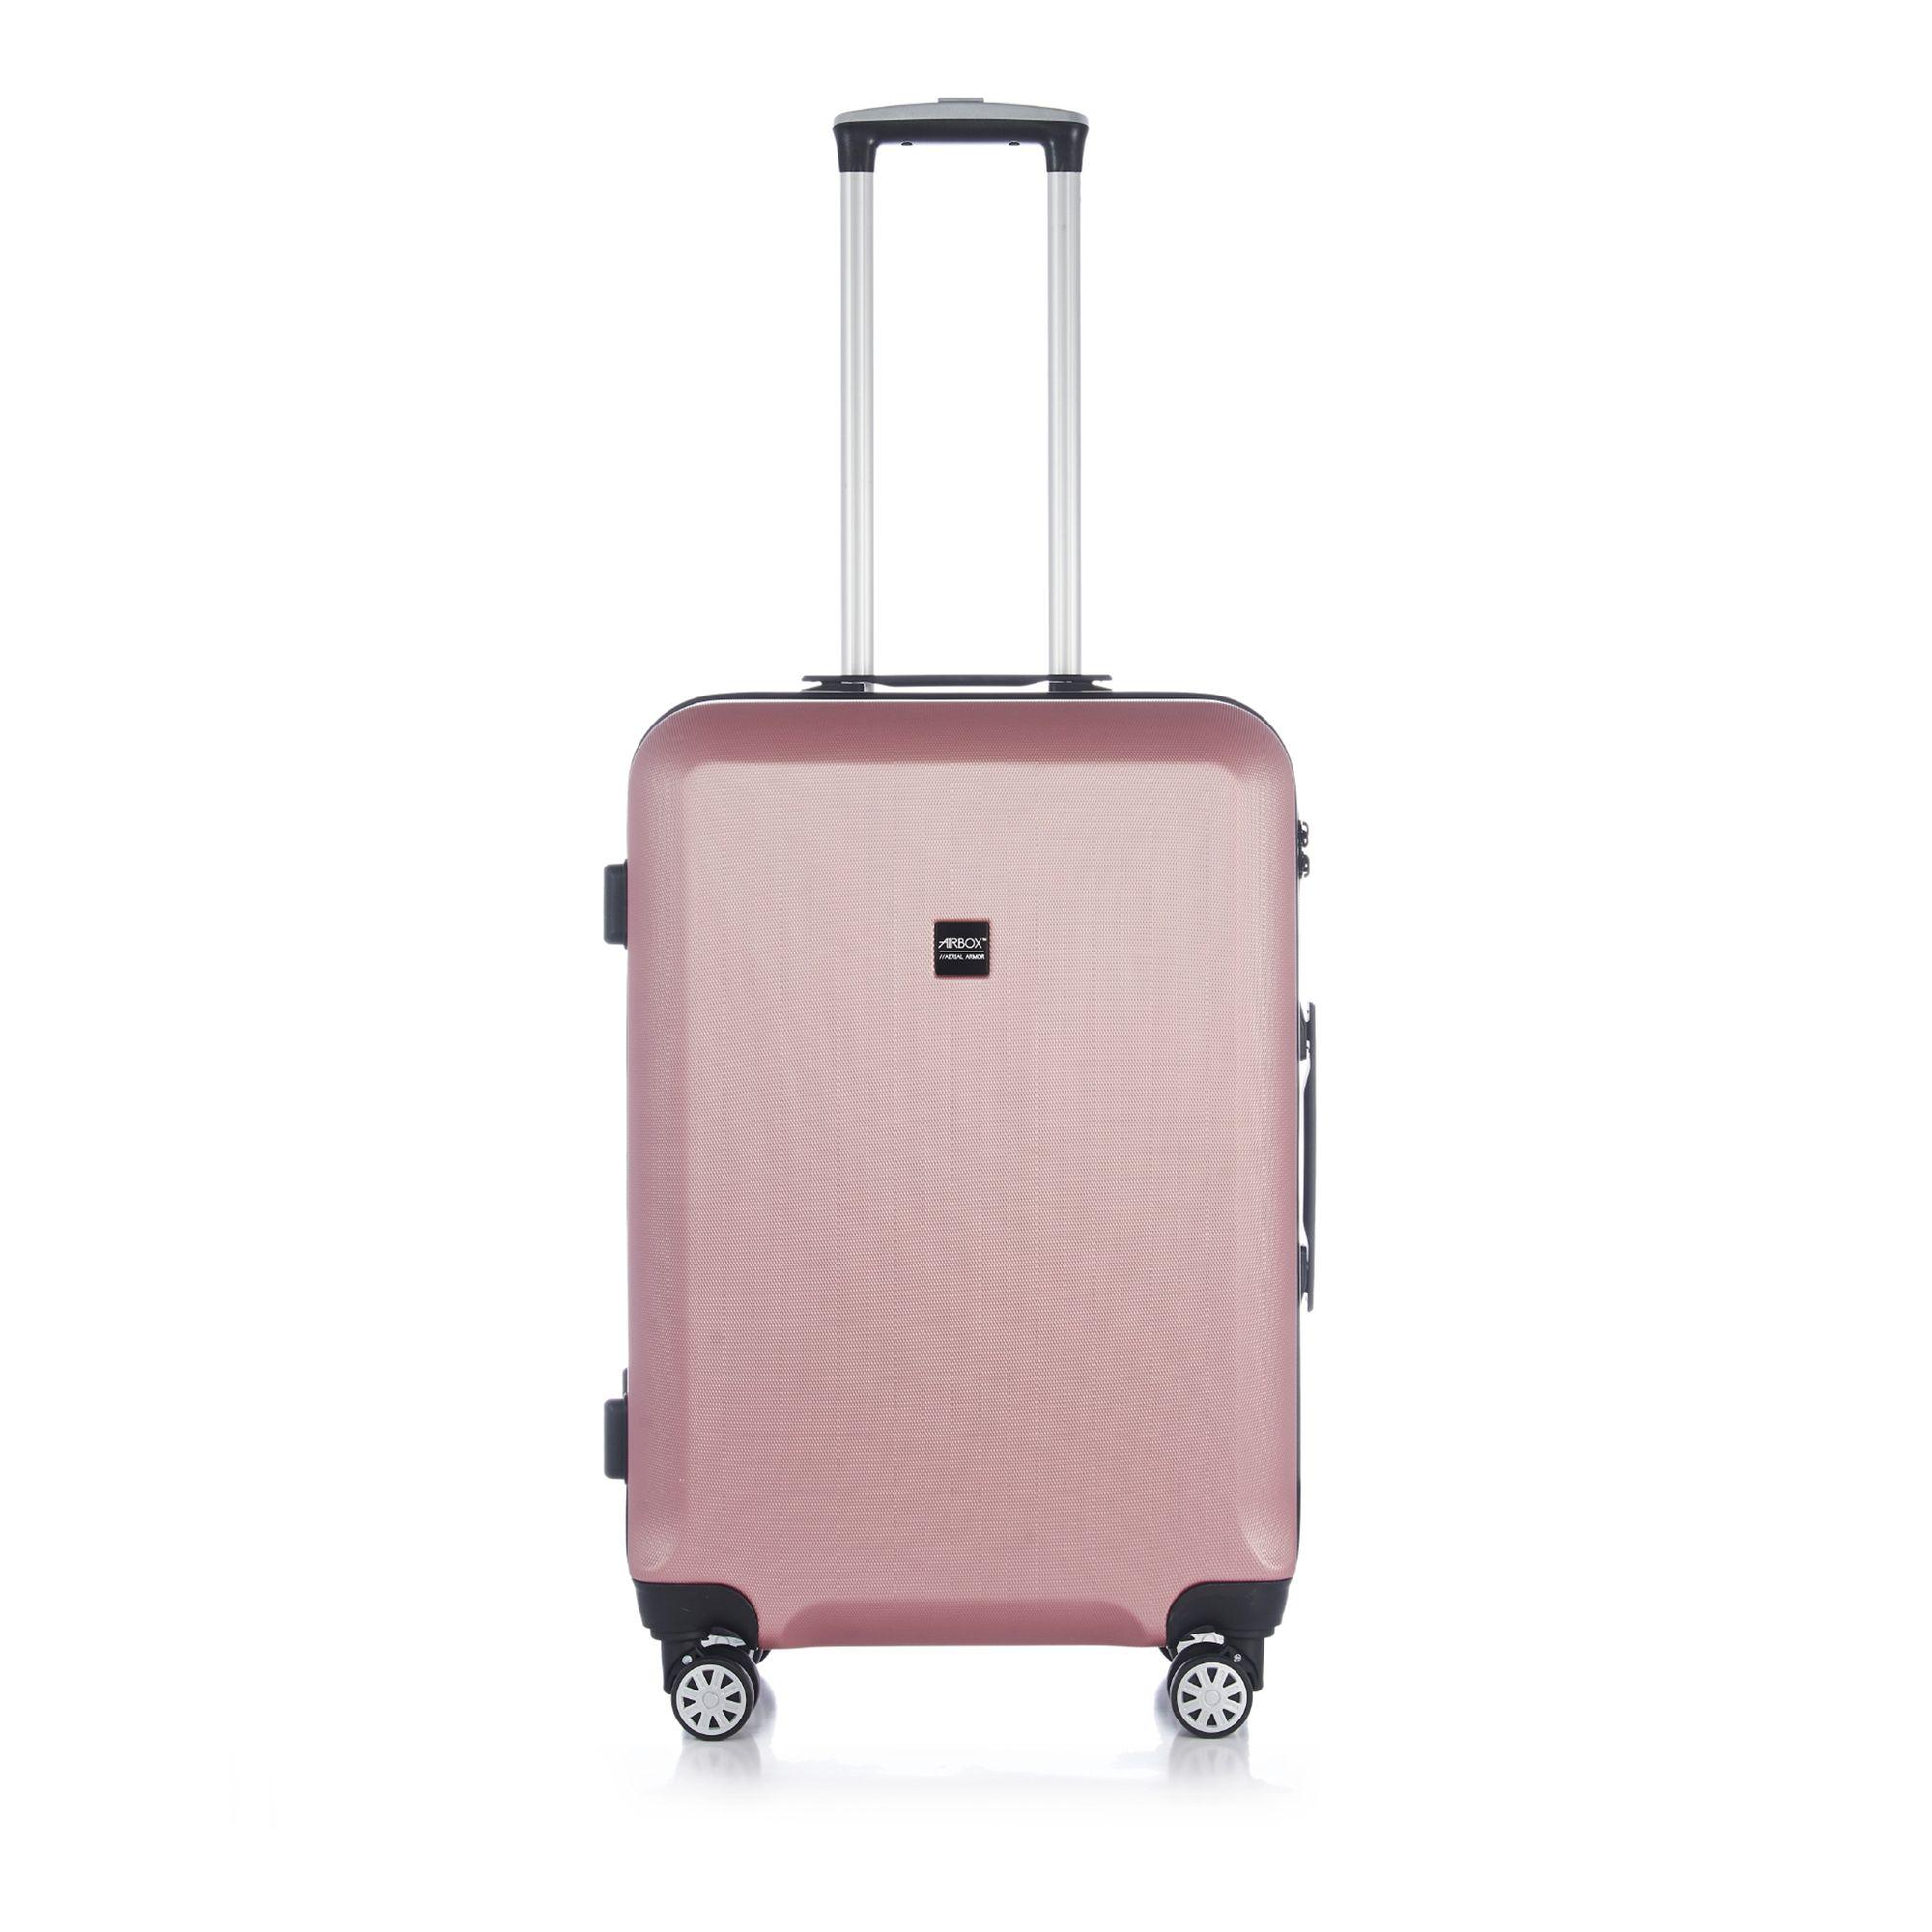 Bilde av Airbox Az8 Hard Koffert Med 4 Hjul, 55/65/75 Cm, Lys Rosa, 65cm